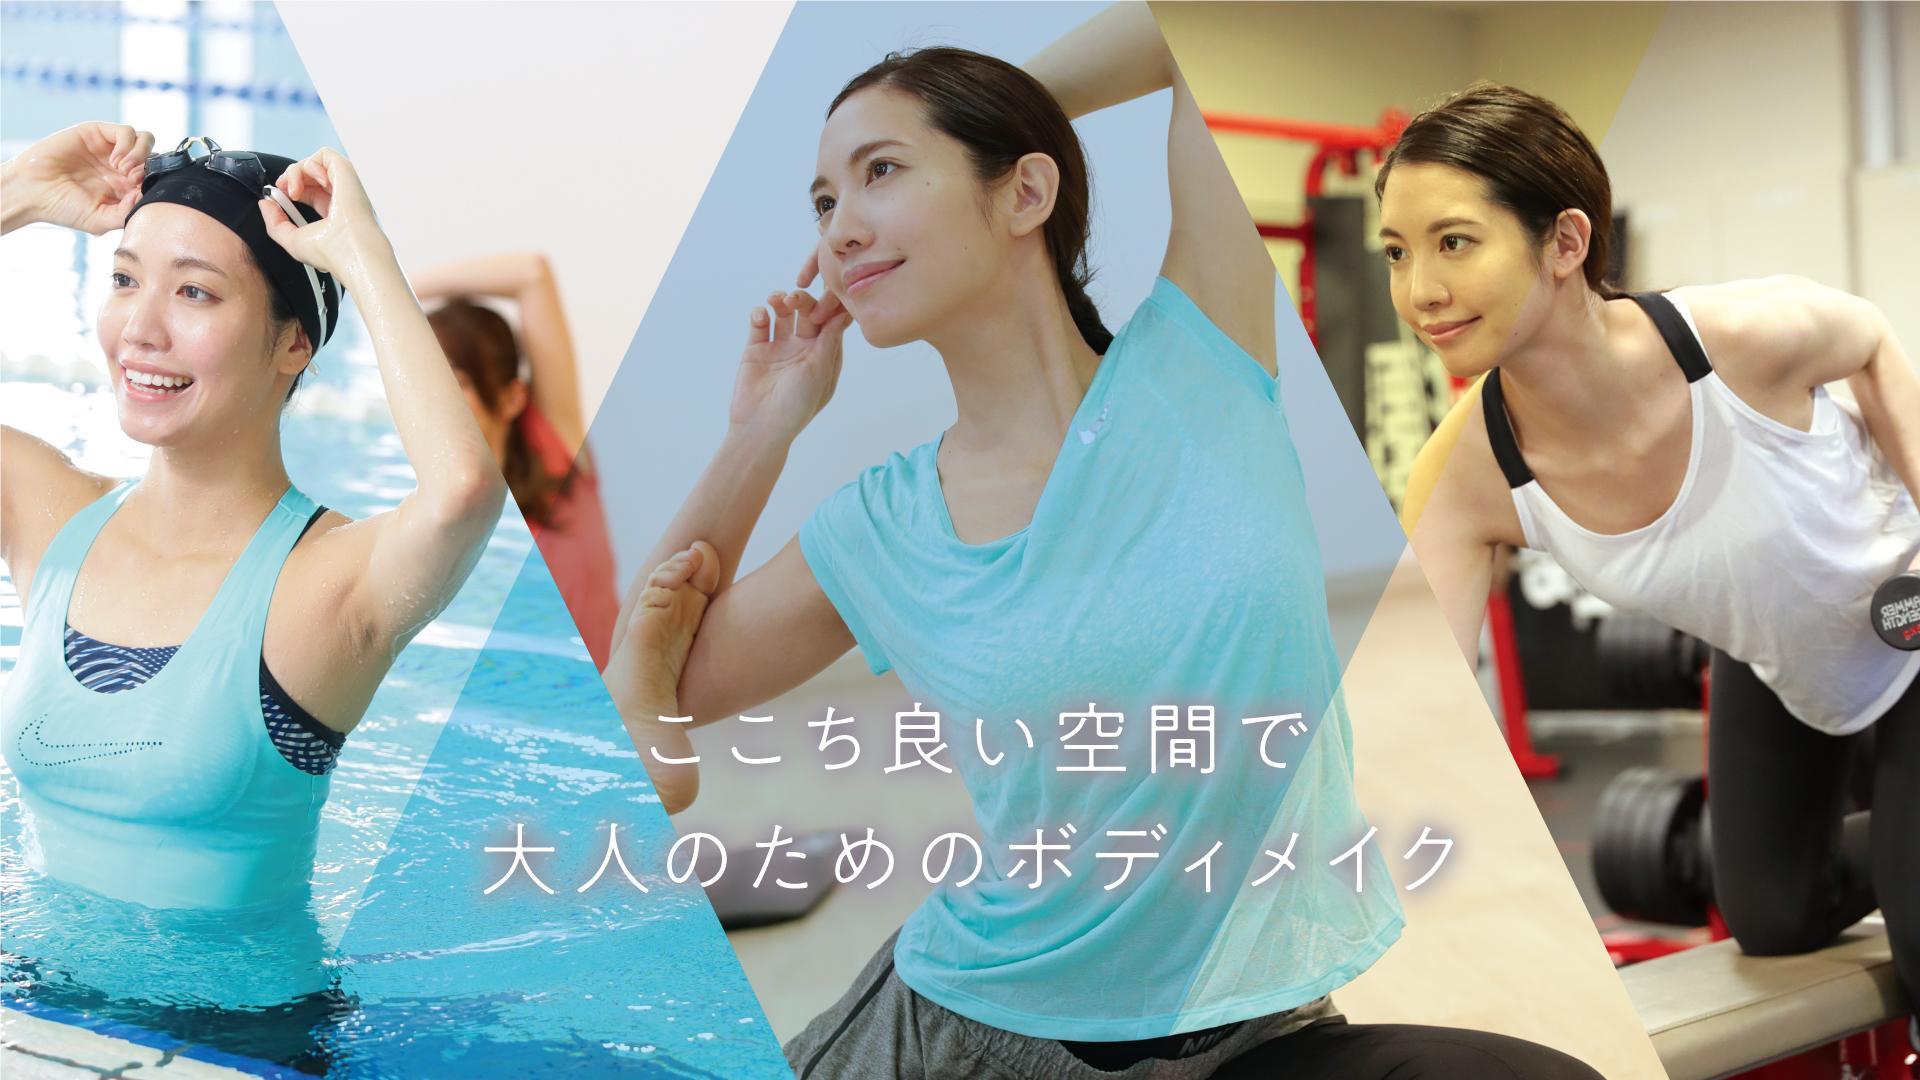 Gunzesports kawanishi グンゼスポーツ 川西